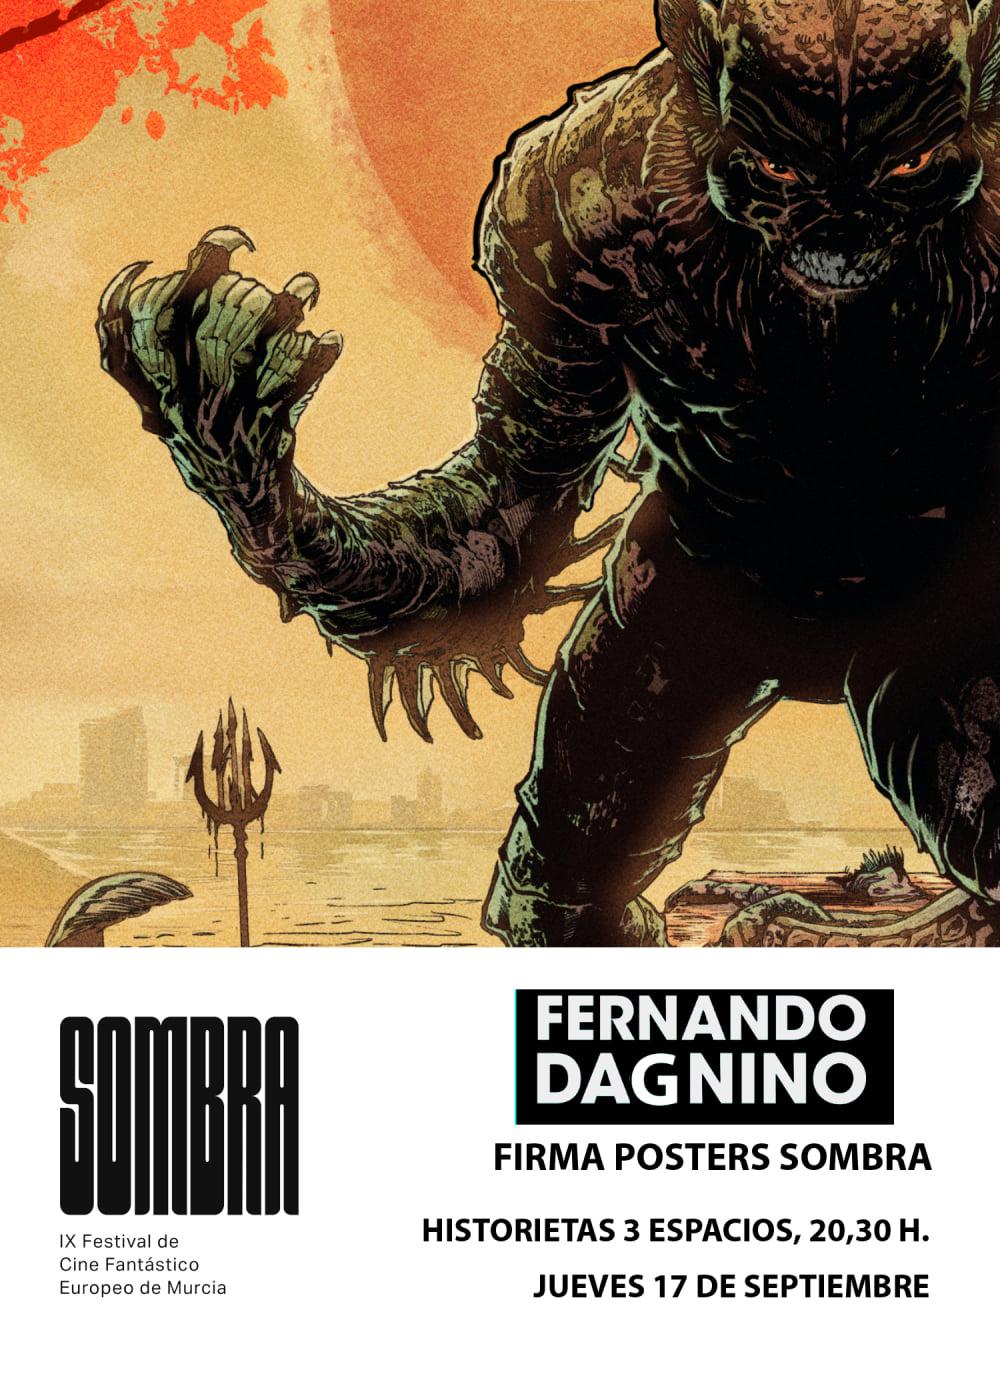 Fernando Dagnino